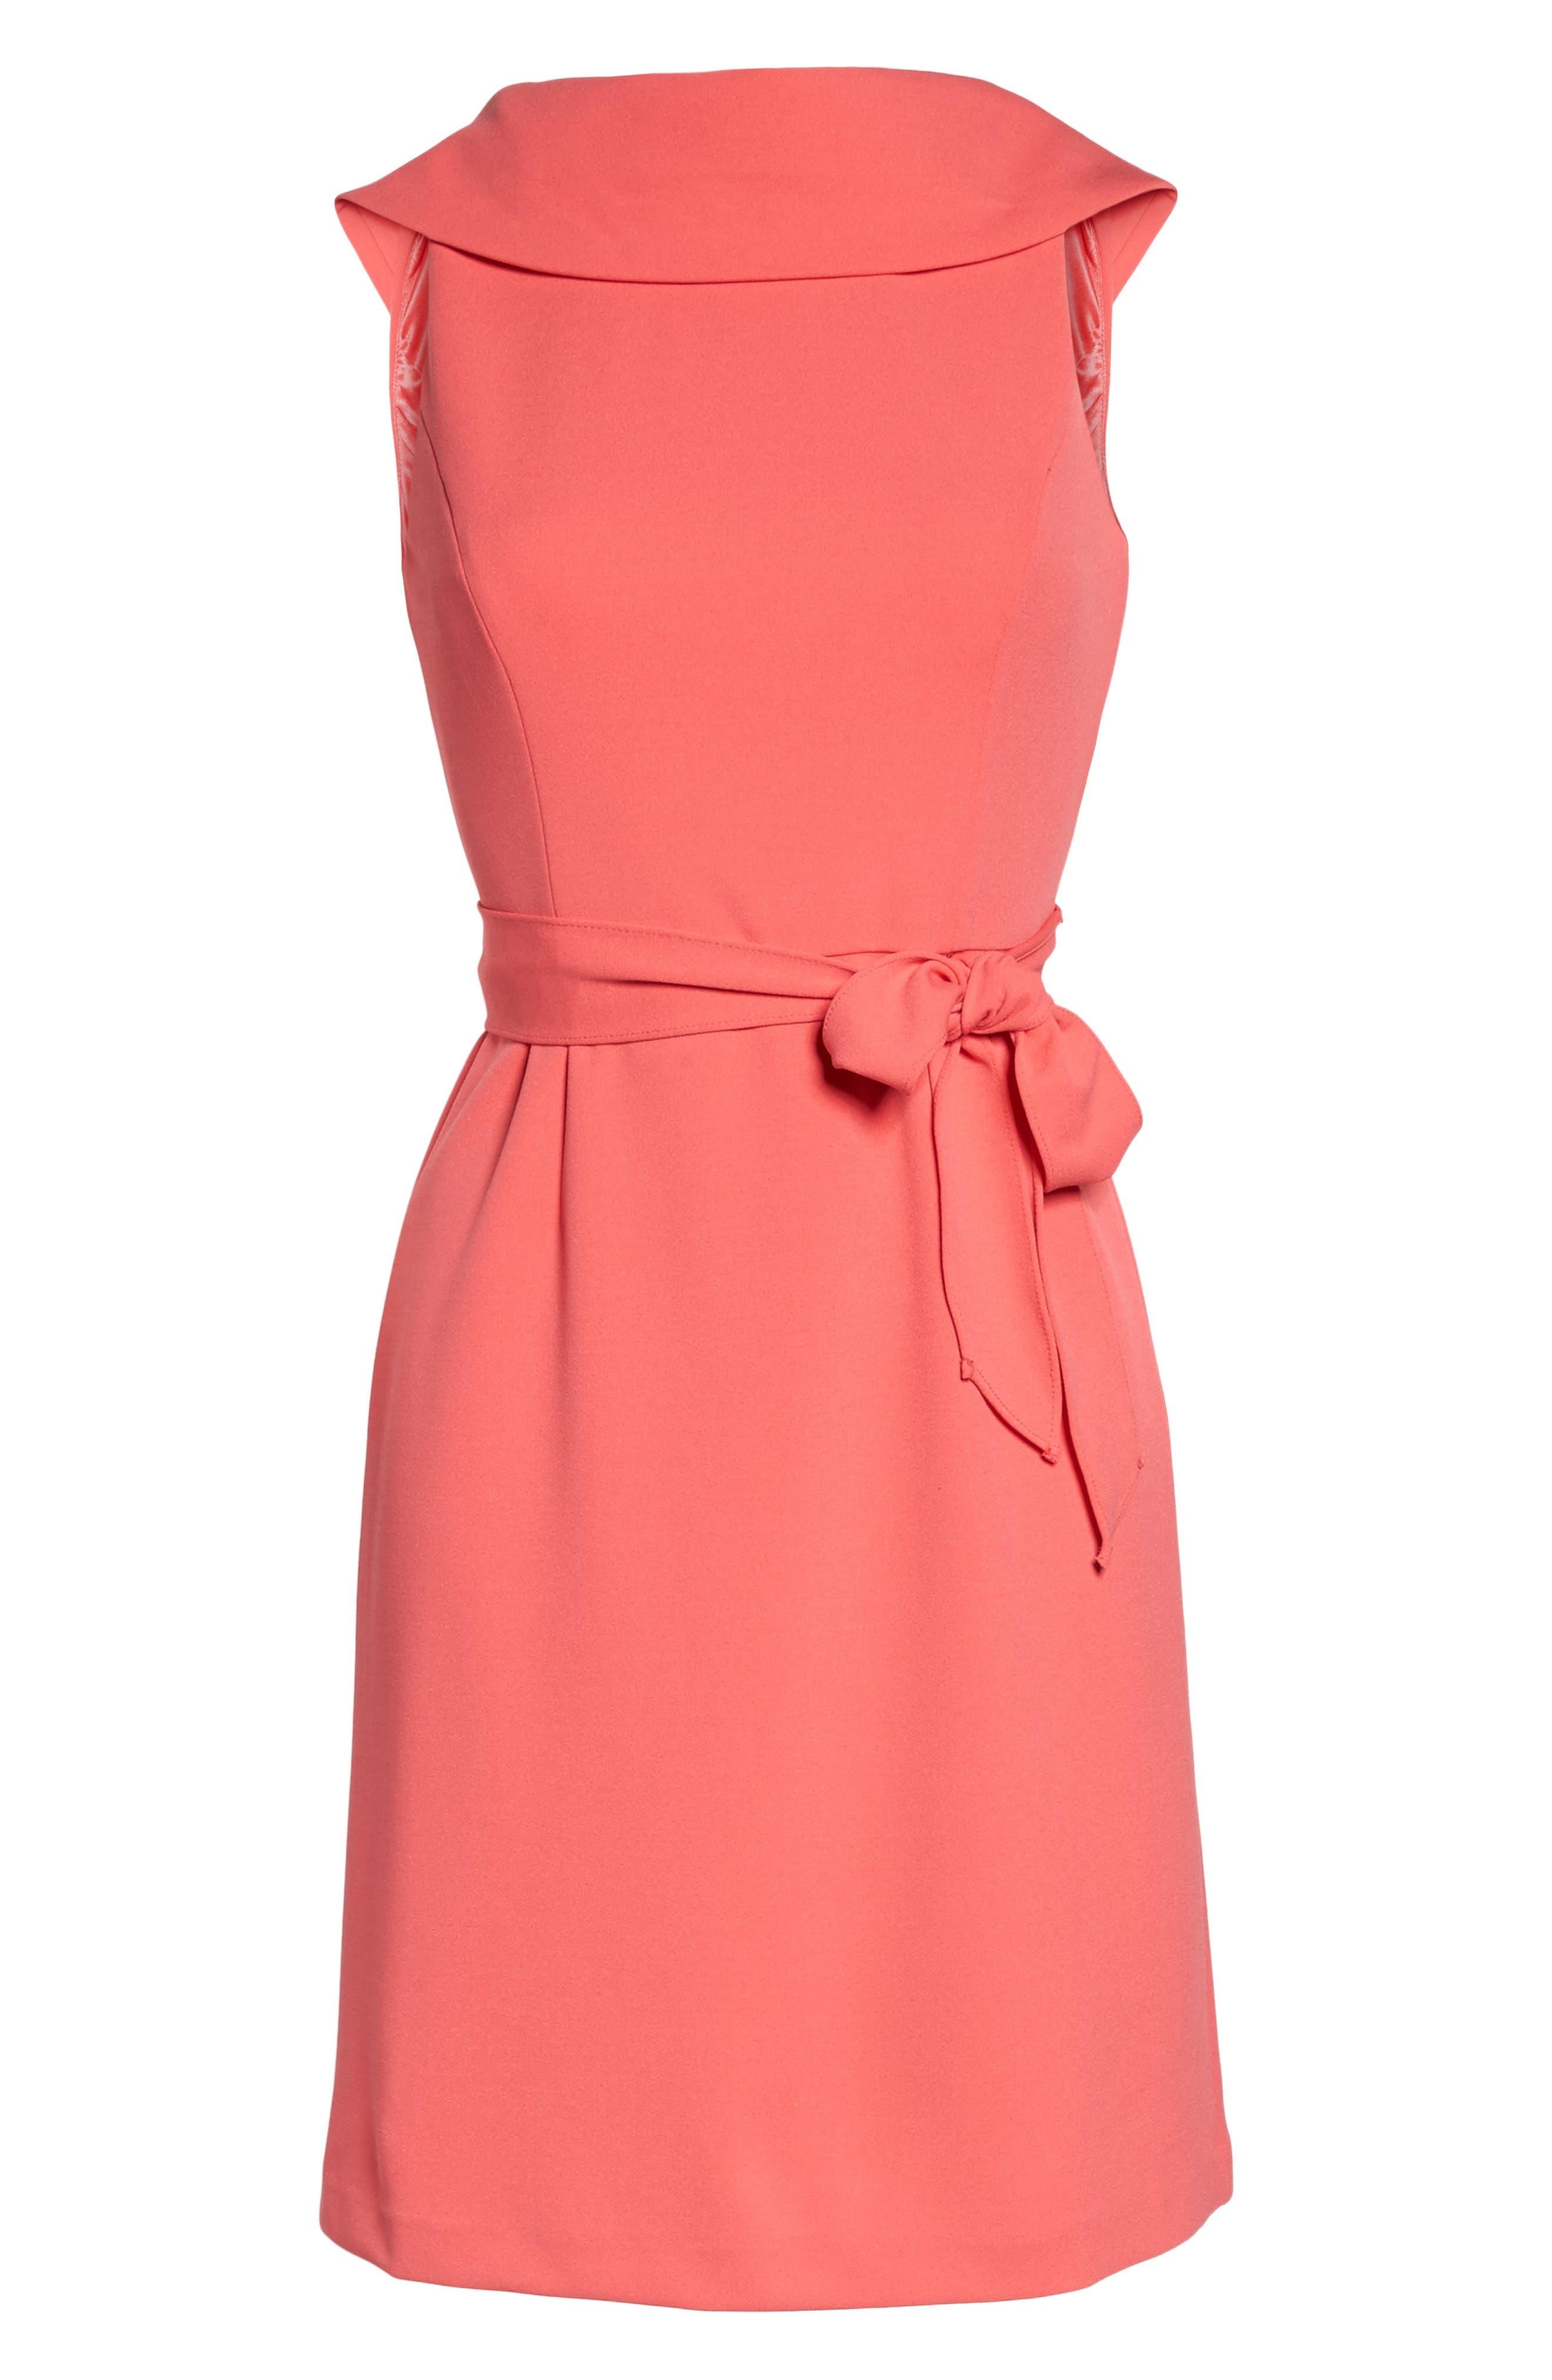 Roll Neck Crepe Dress,                             Alternate thumbnail 6, color,                             650